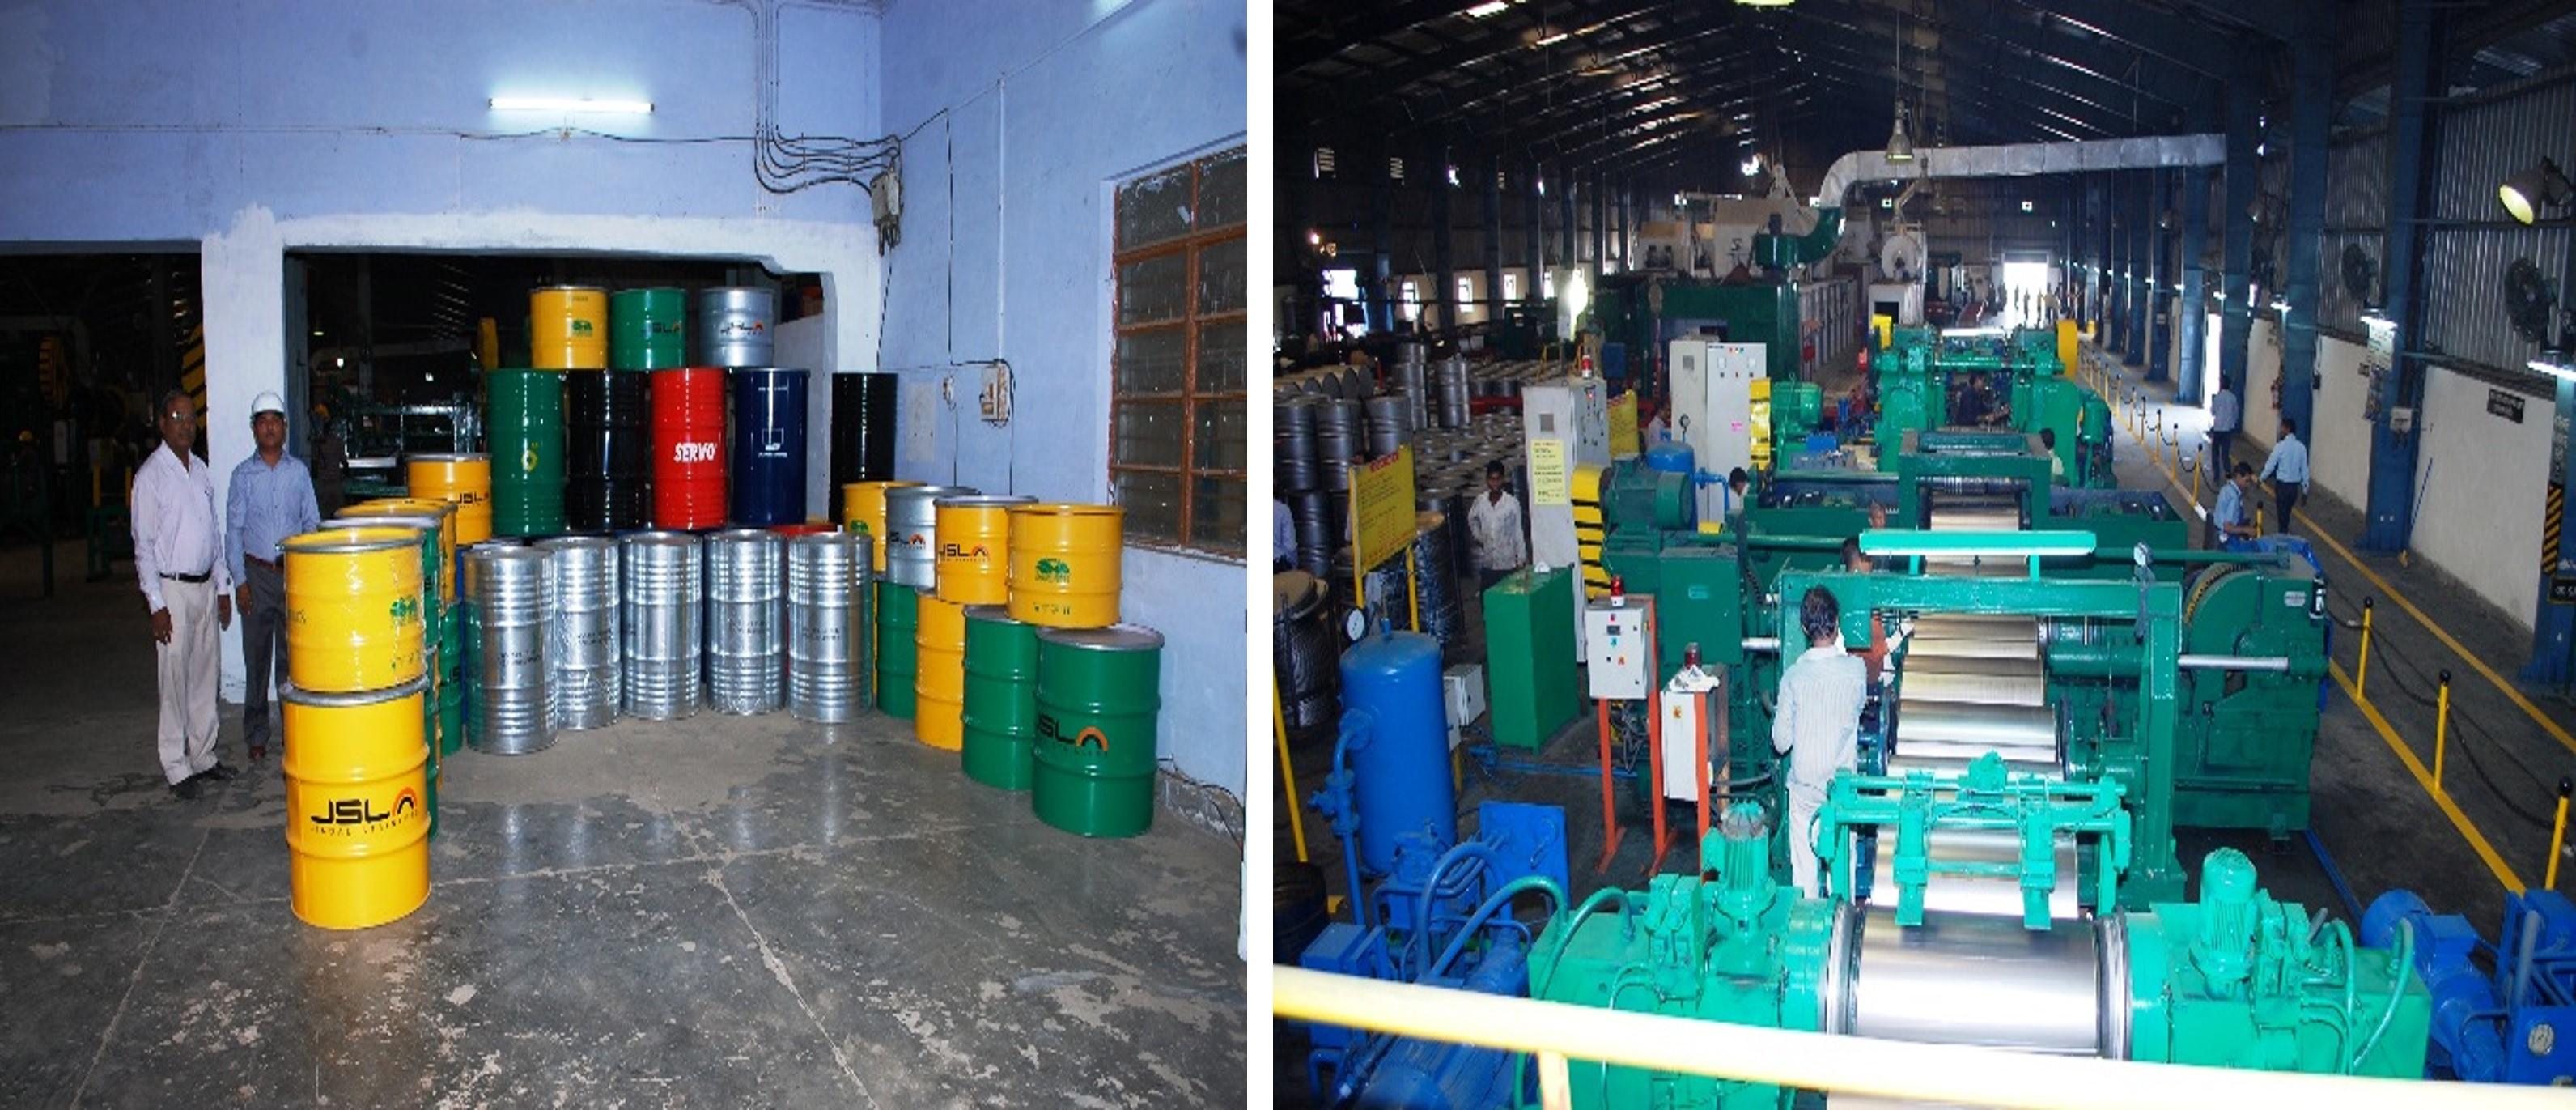 Steel barrels manufactured at IP Asaoti, Steel barrels being manufactured at IP Asaoti